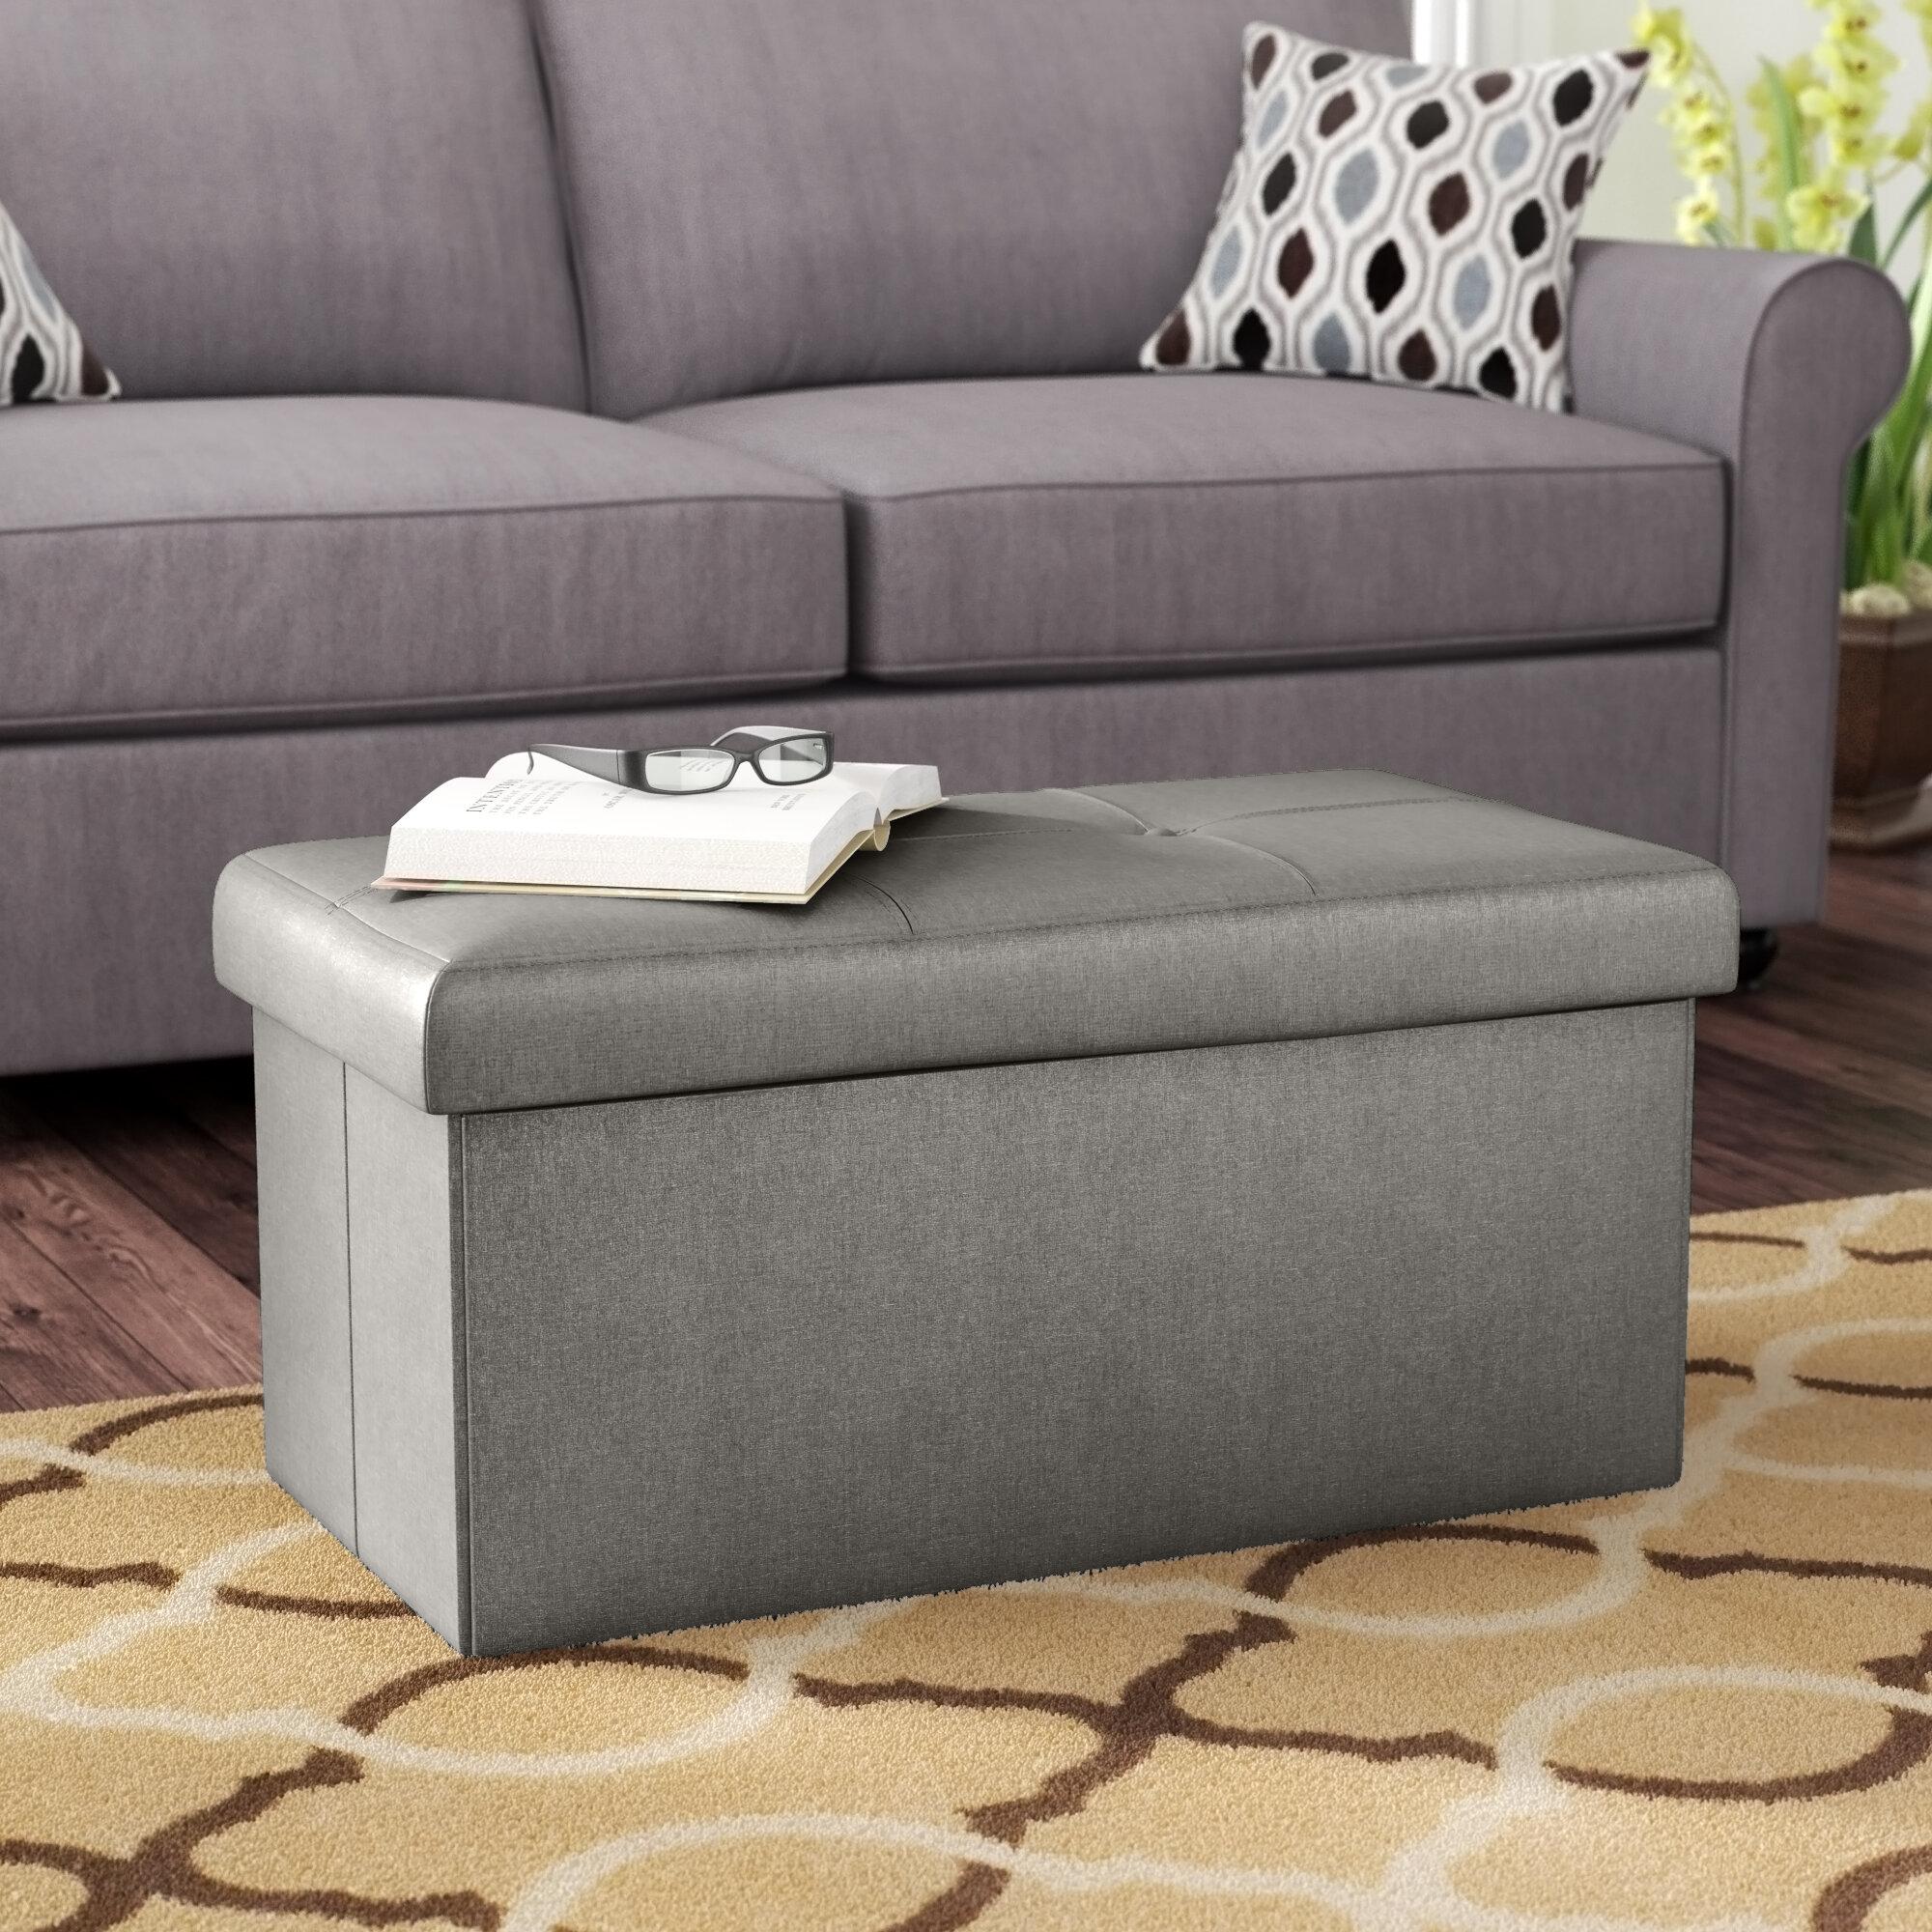 Sensational Hobert Double Tufted Storage Ottoman Pabps2019 Chair Design Images Pabps2019Com